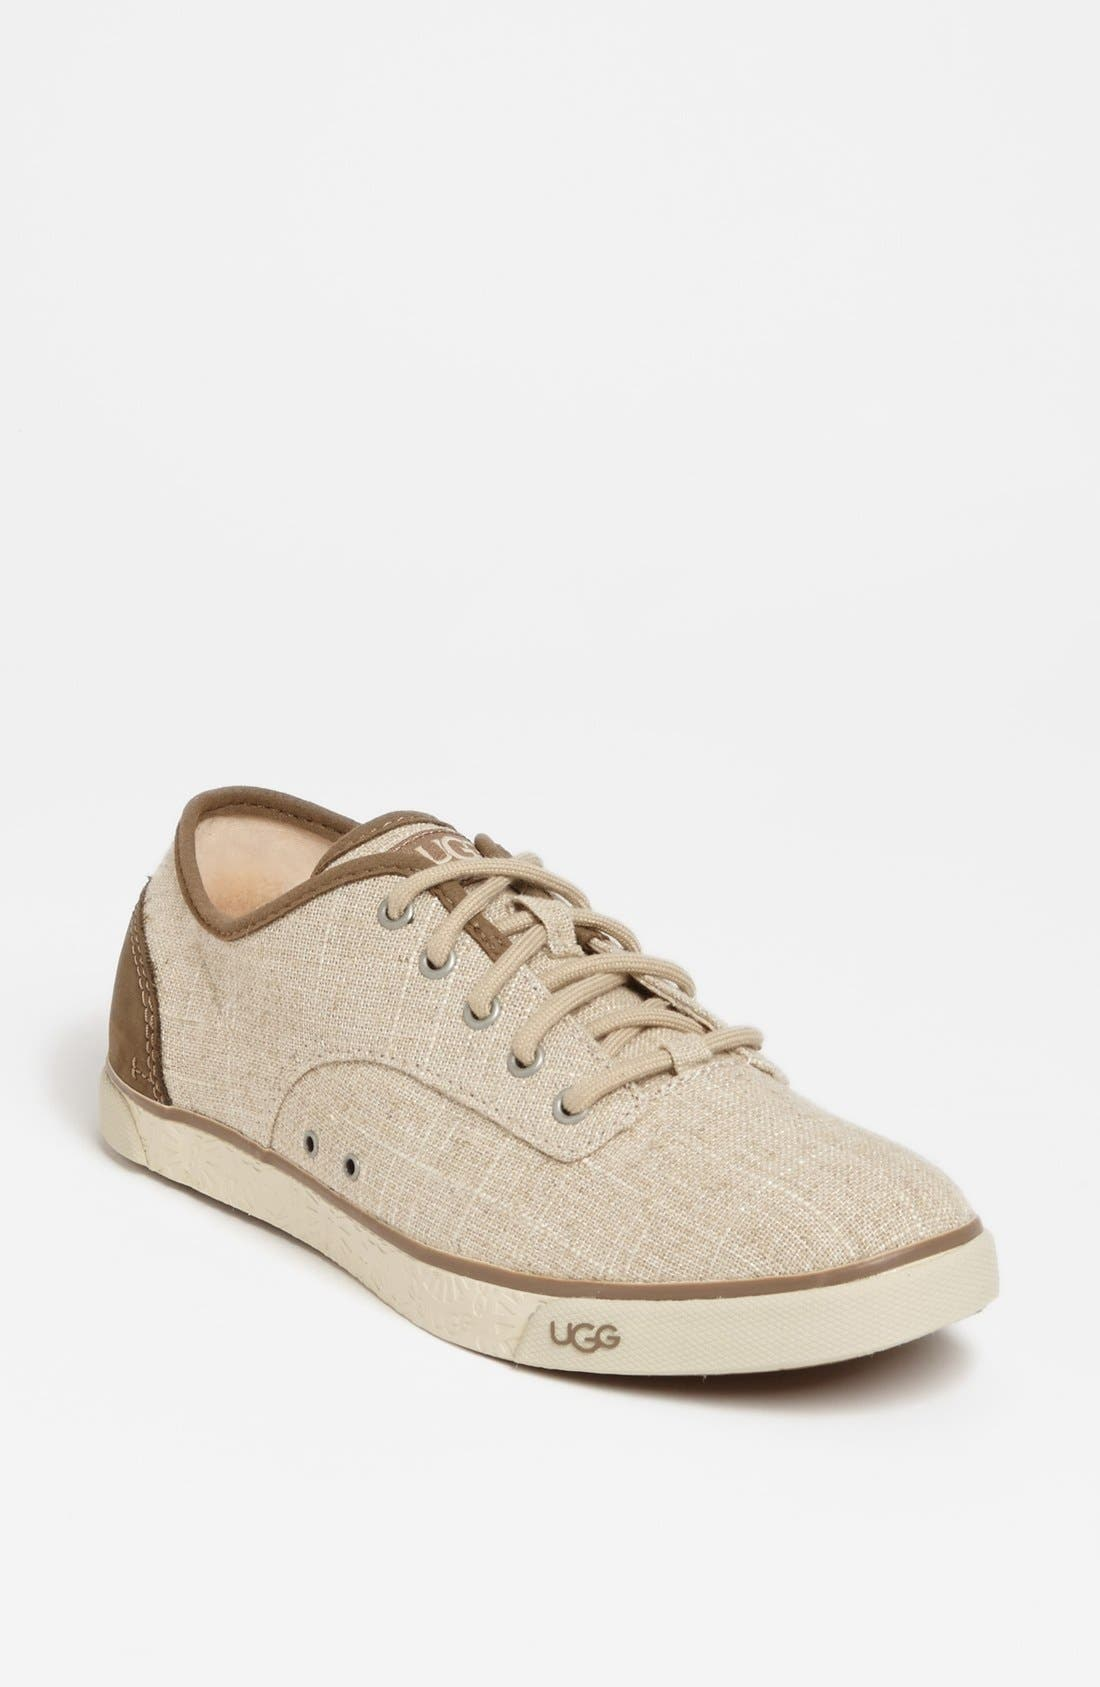 Main Image - UGG® Australia 'Hally' Sneaker (Women)